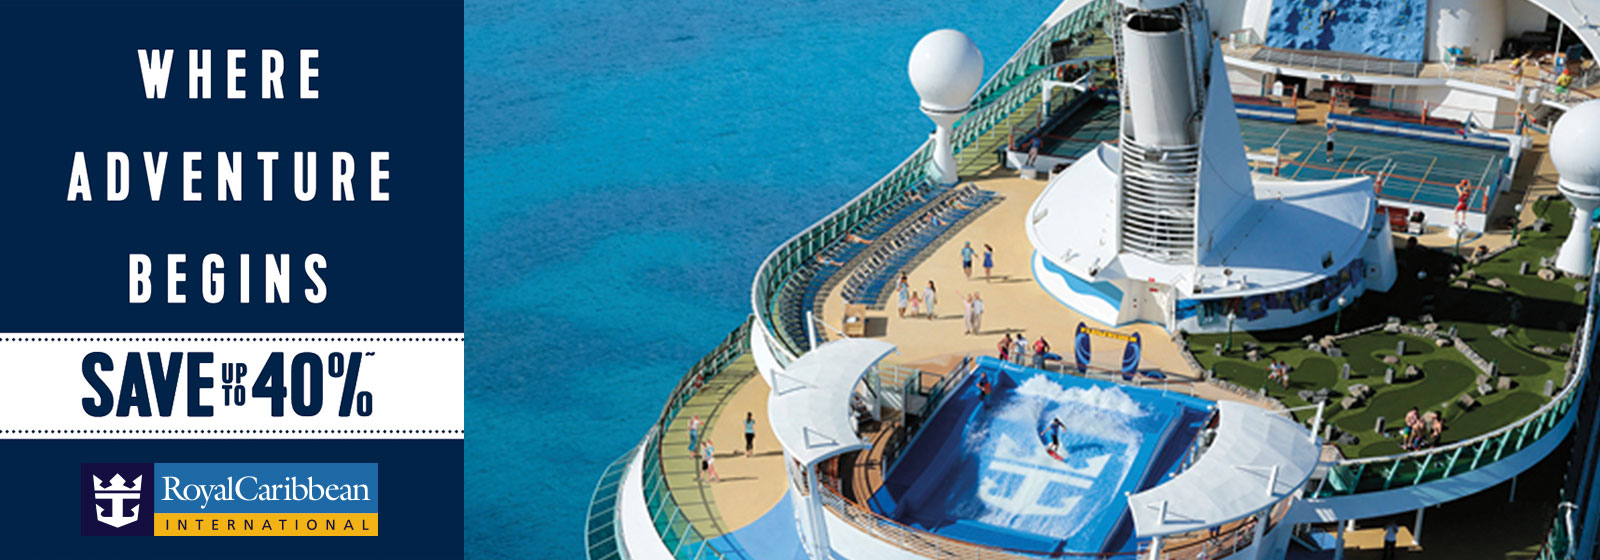 Royal Caribbean - Where adventure begins